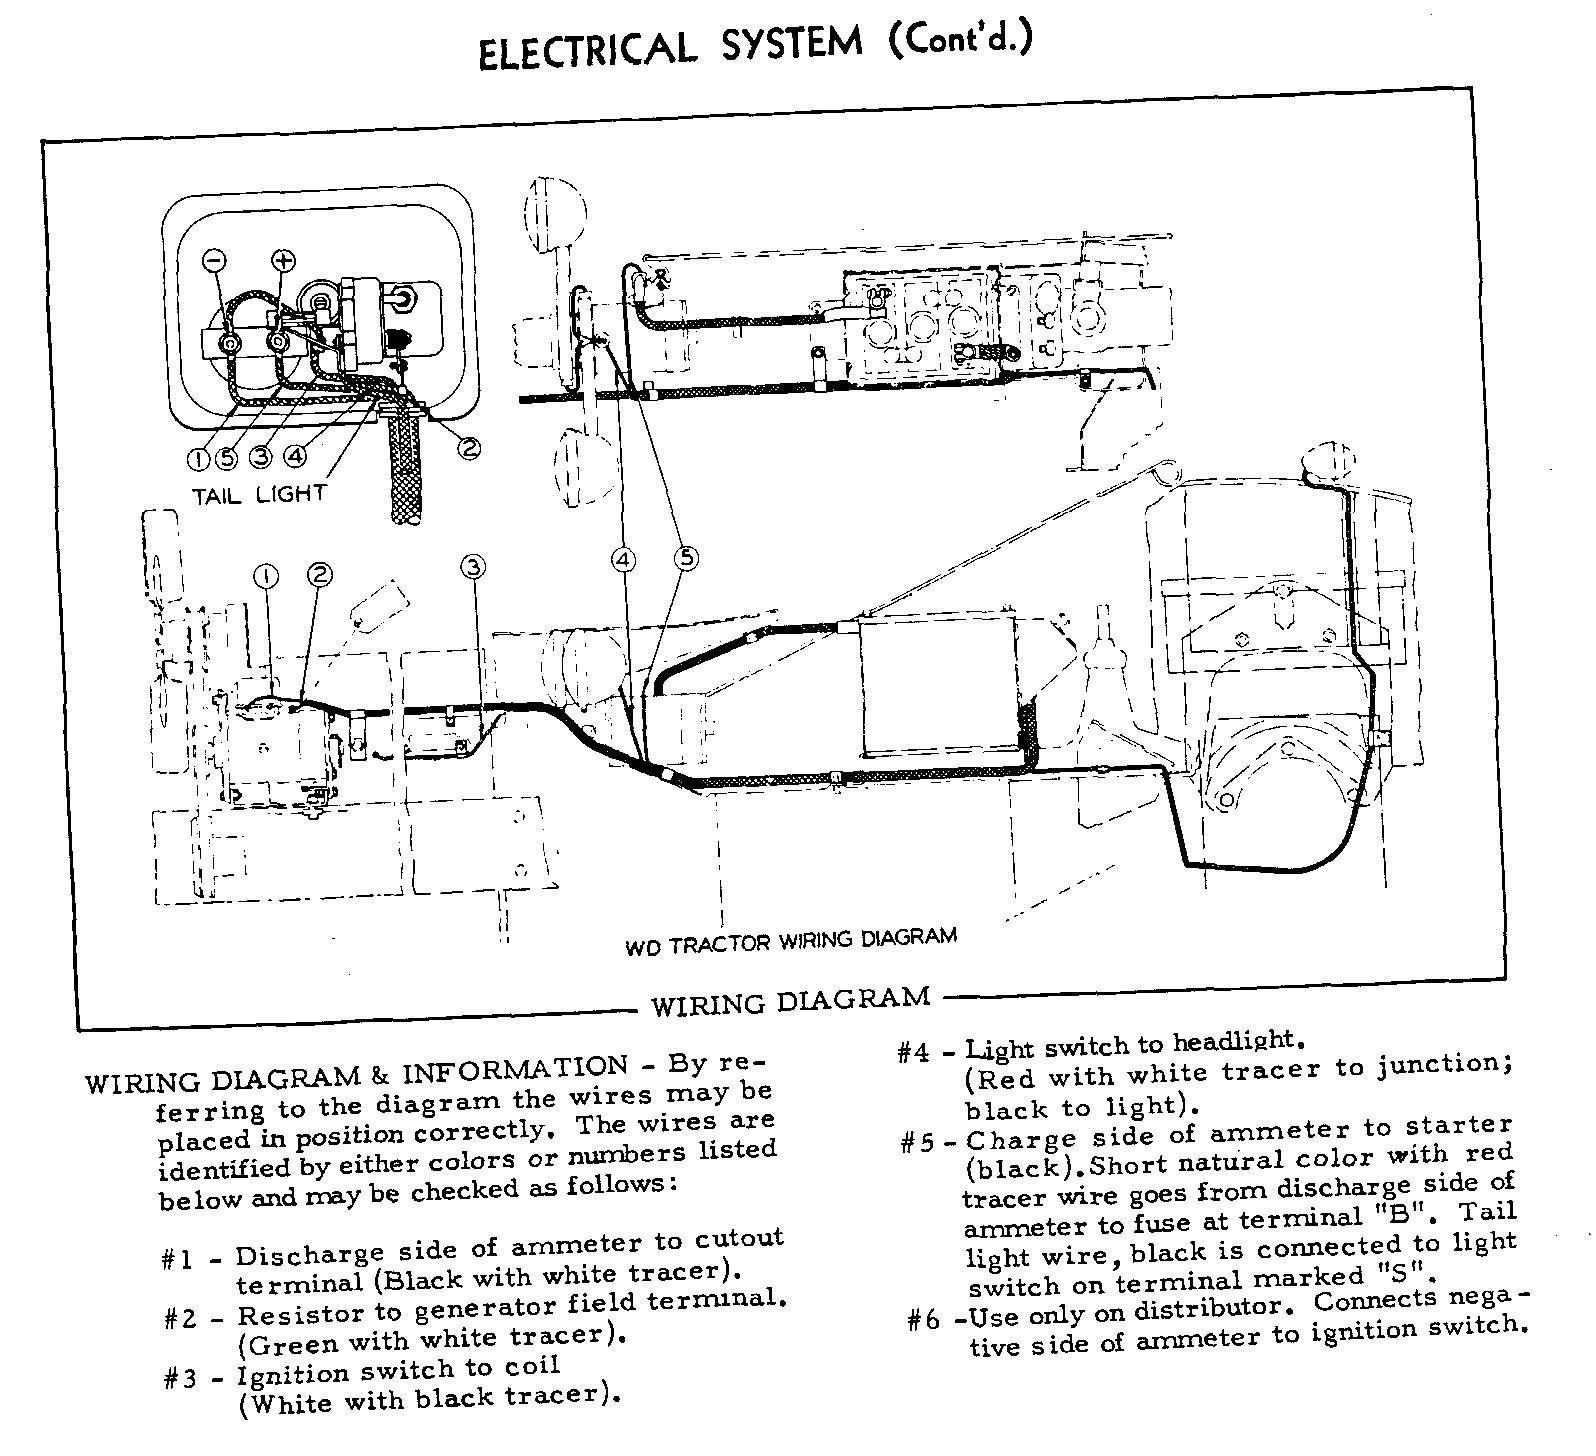 diagram of a diesel engine universal ignition switch wiring diagram rh detoxicrecenze com  wiring diagram for diesel engine ignition switch